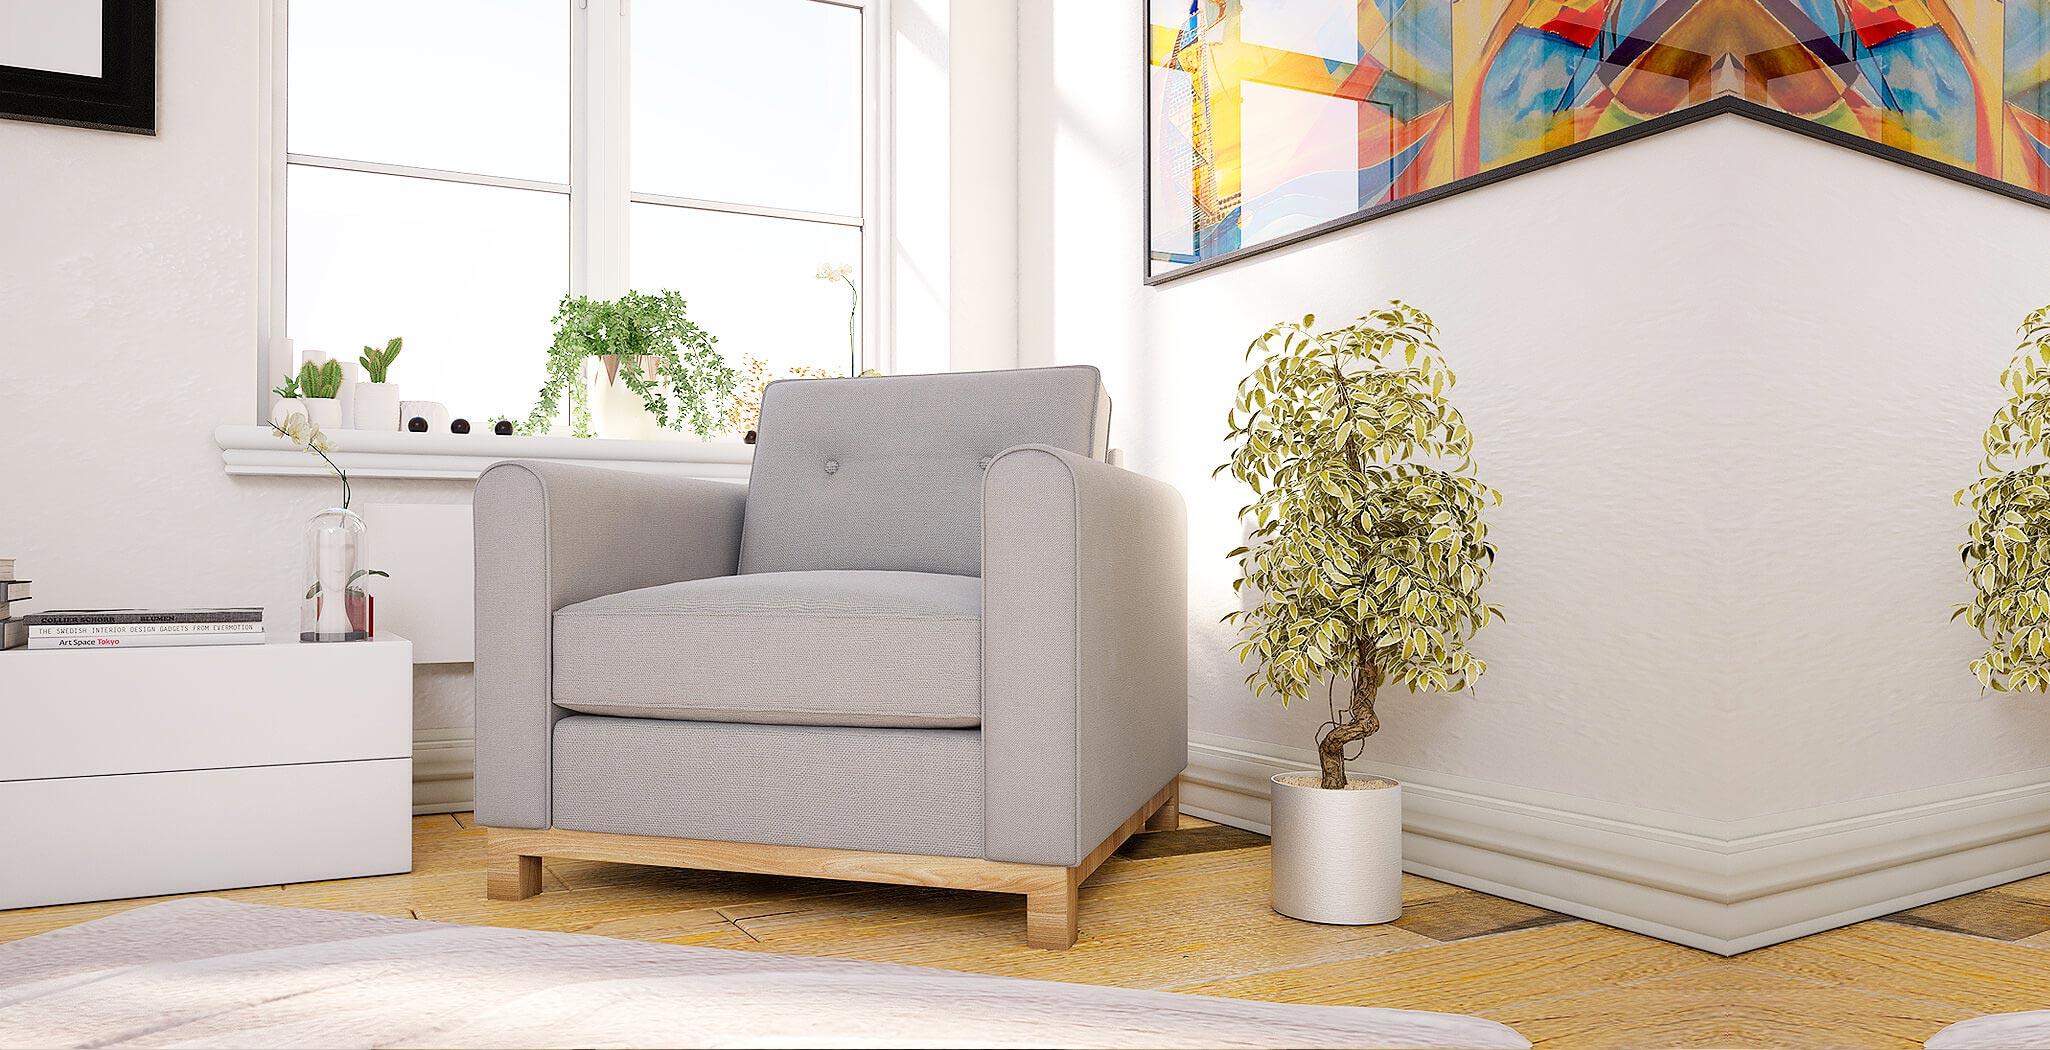 rio chair furniture gallery 2